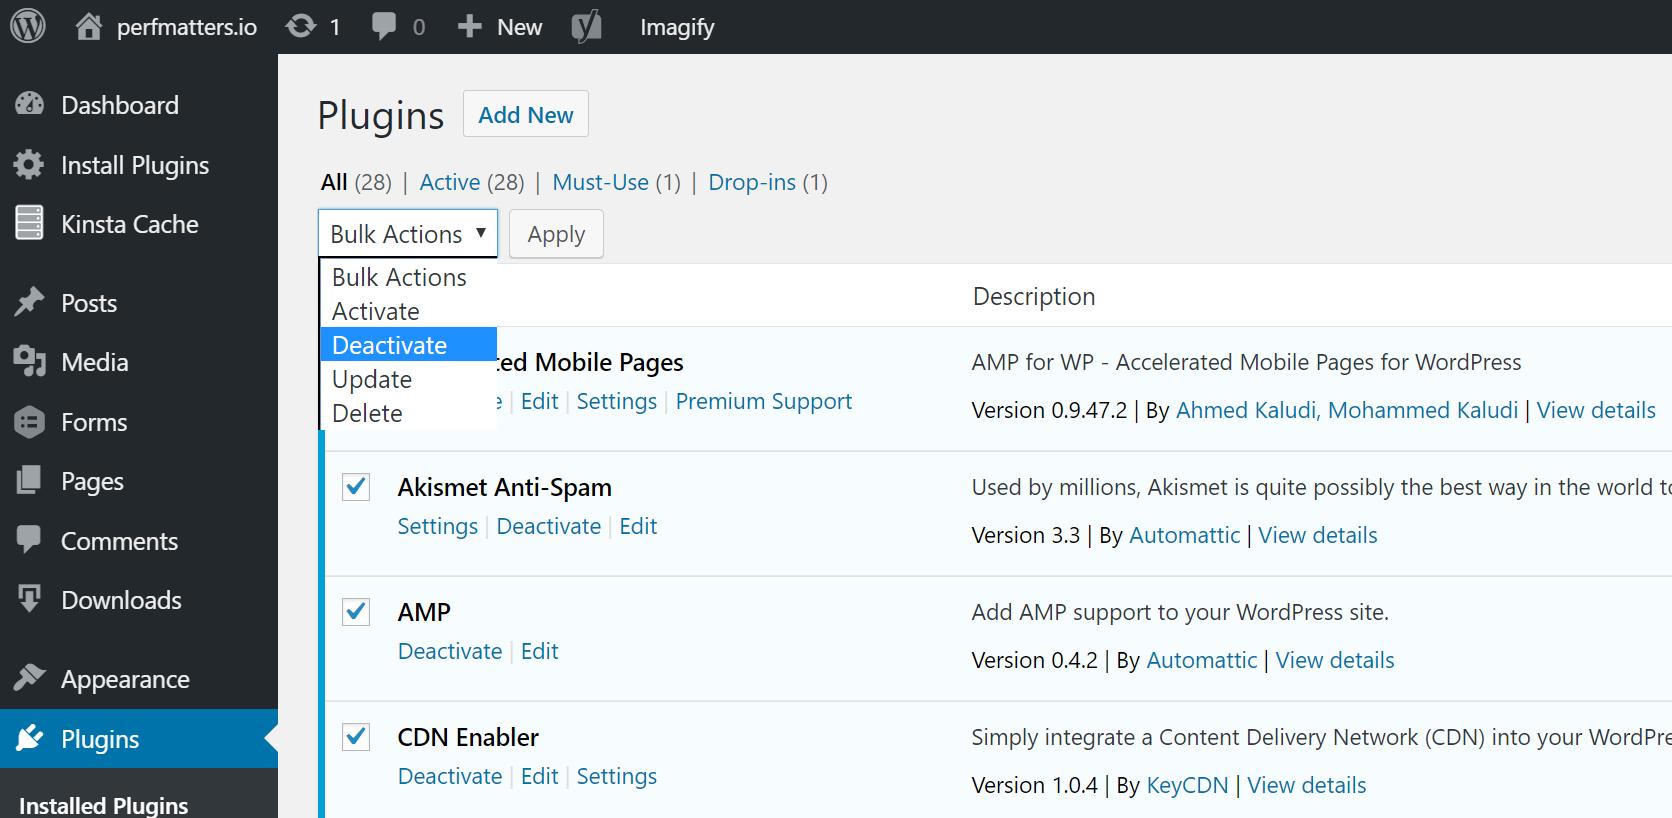 Disattivare tutti i plugin di WordPress